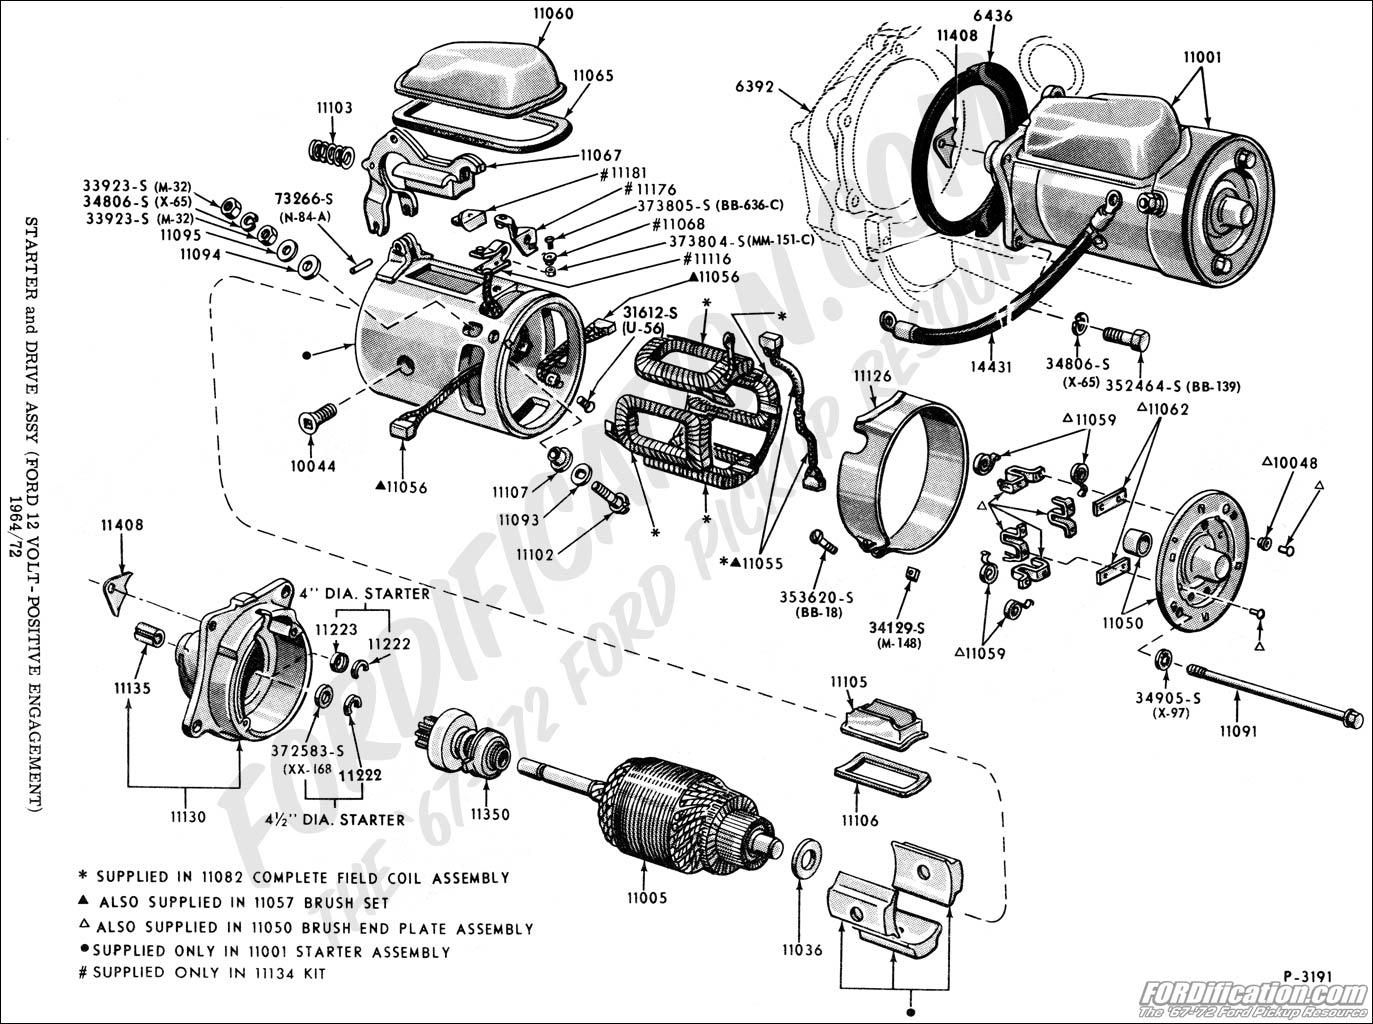 BMW Rear Main Seal Leak